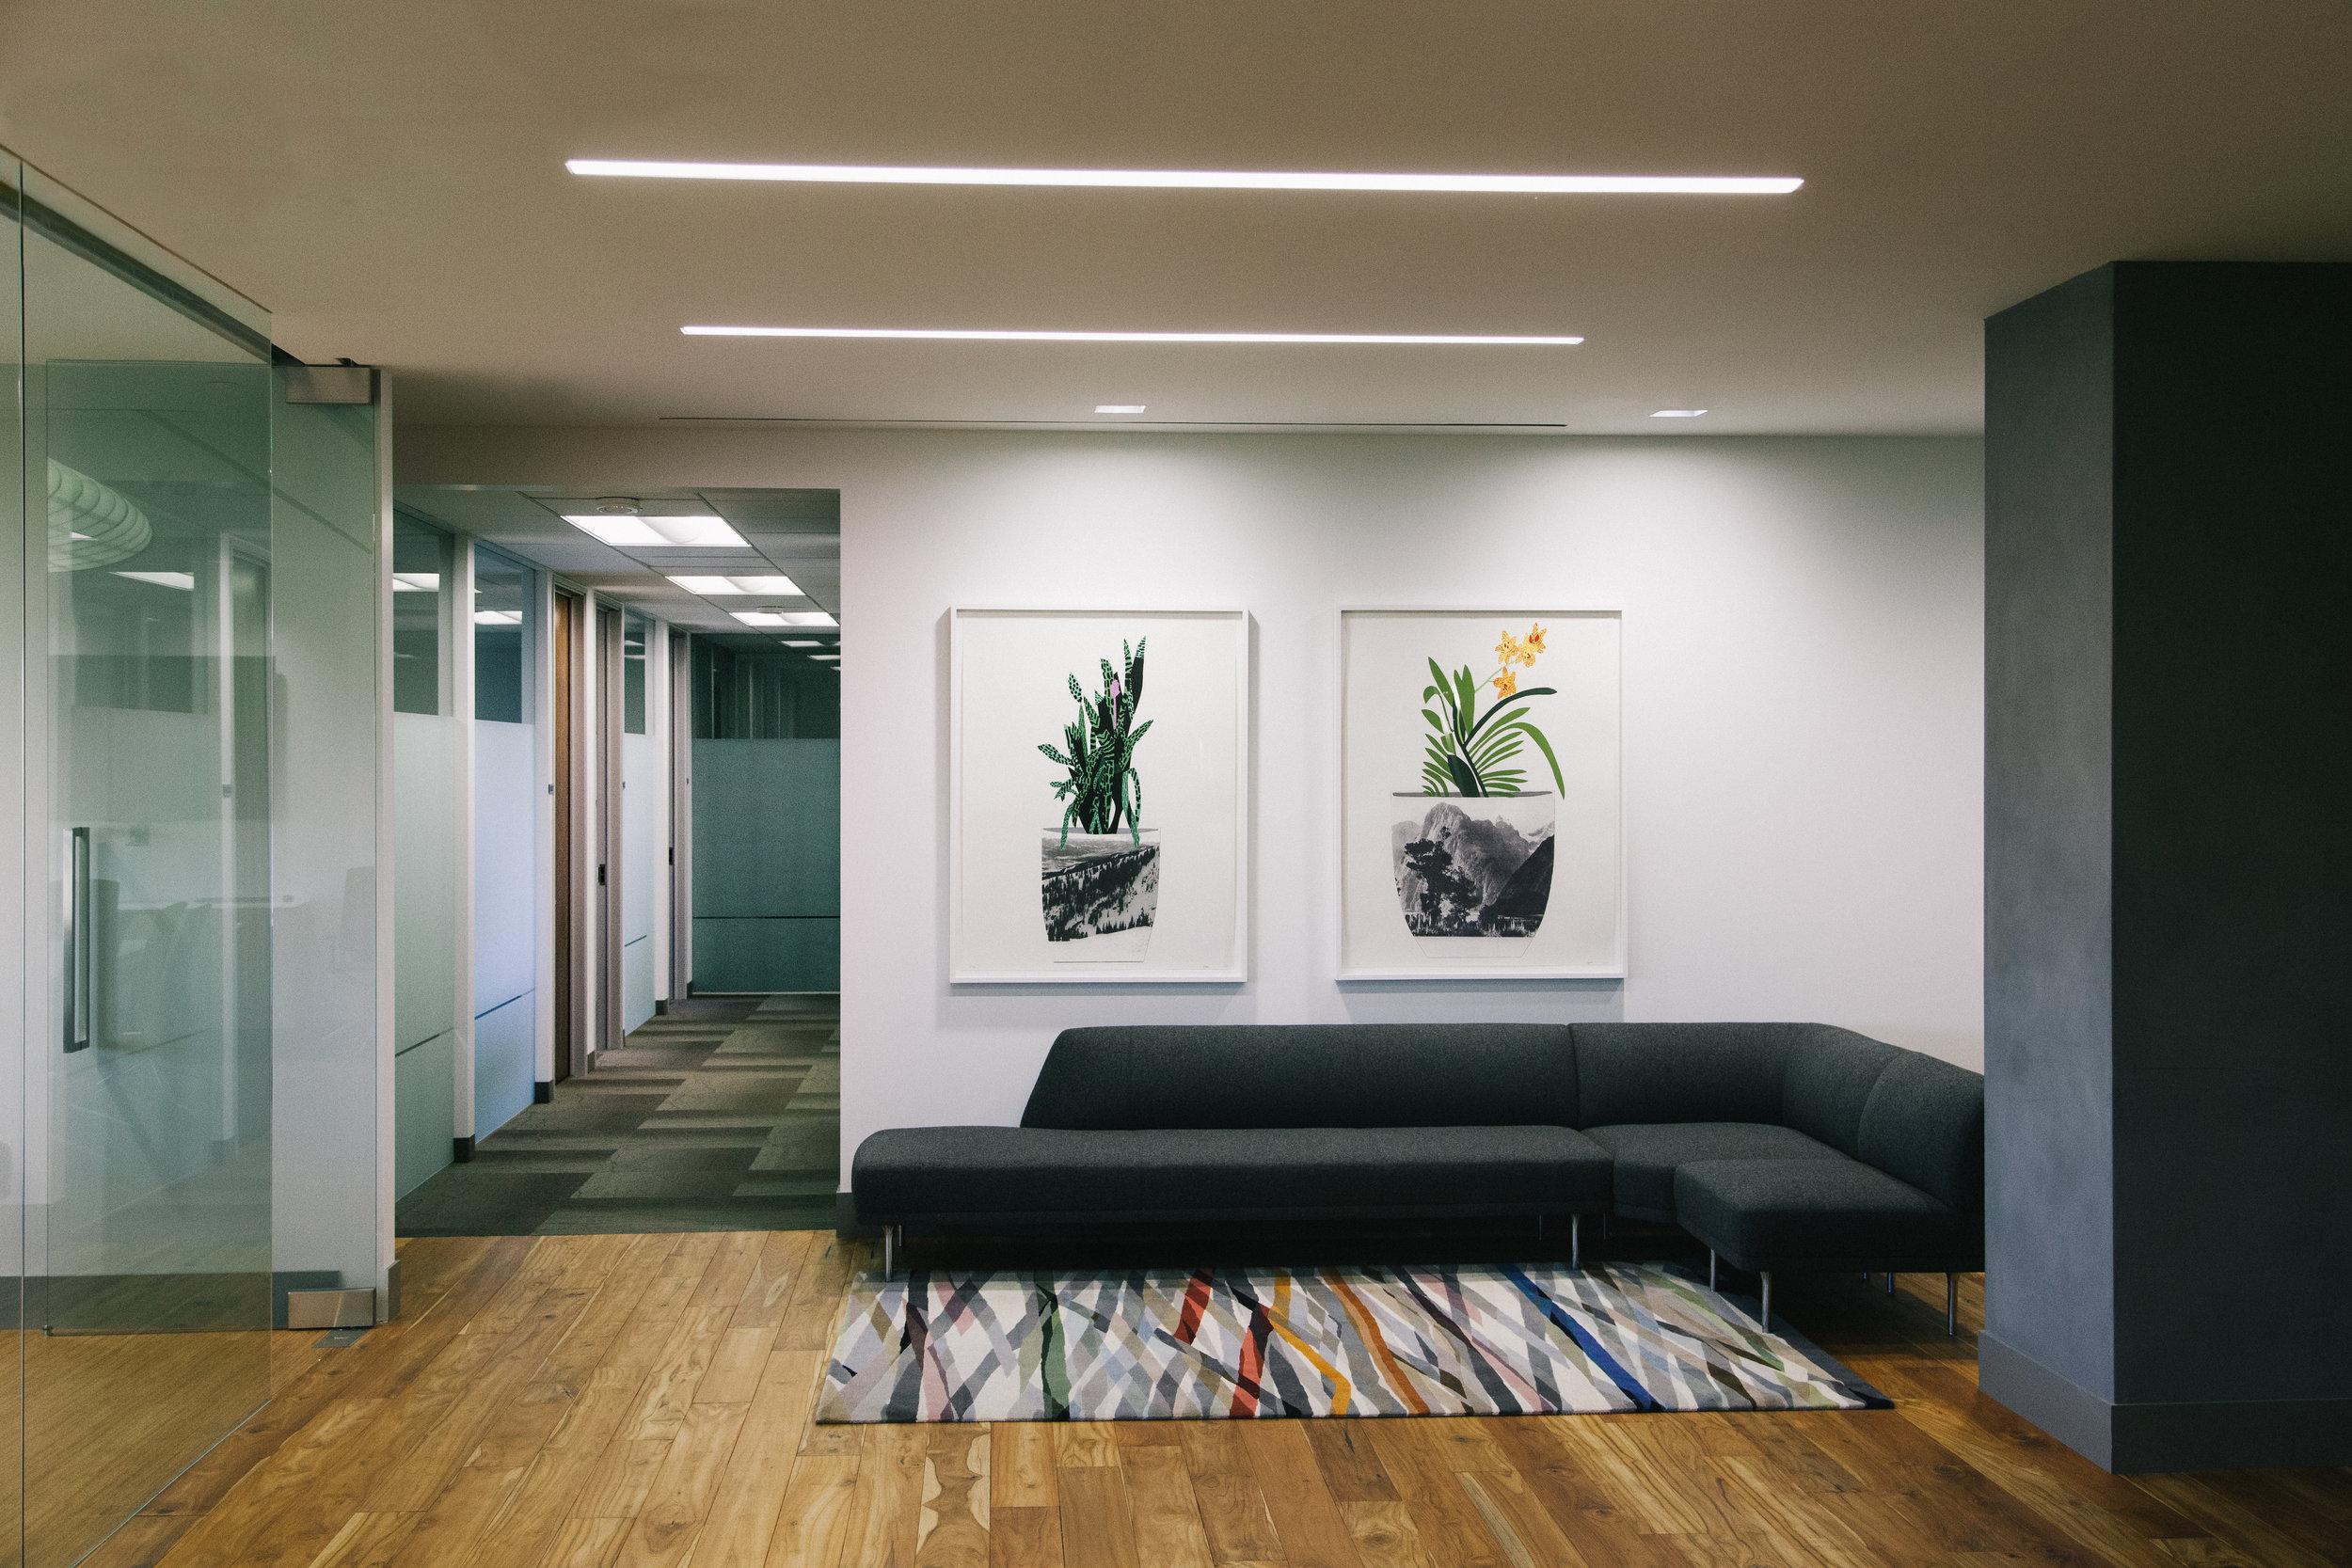 S.E.A.-Studio-Environmental-Architecture-David-Hertz-FAIA-First-Pacific-Advisors-Los-Angeles-tenant-improvement-sustainable-regenerative-restorative-green-design-office-sleek-modern-interior-Westside-commercial-building-professional-workplace-2.jpg